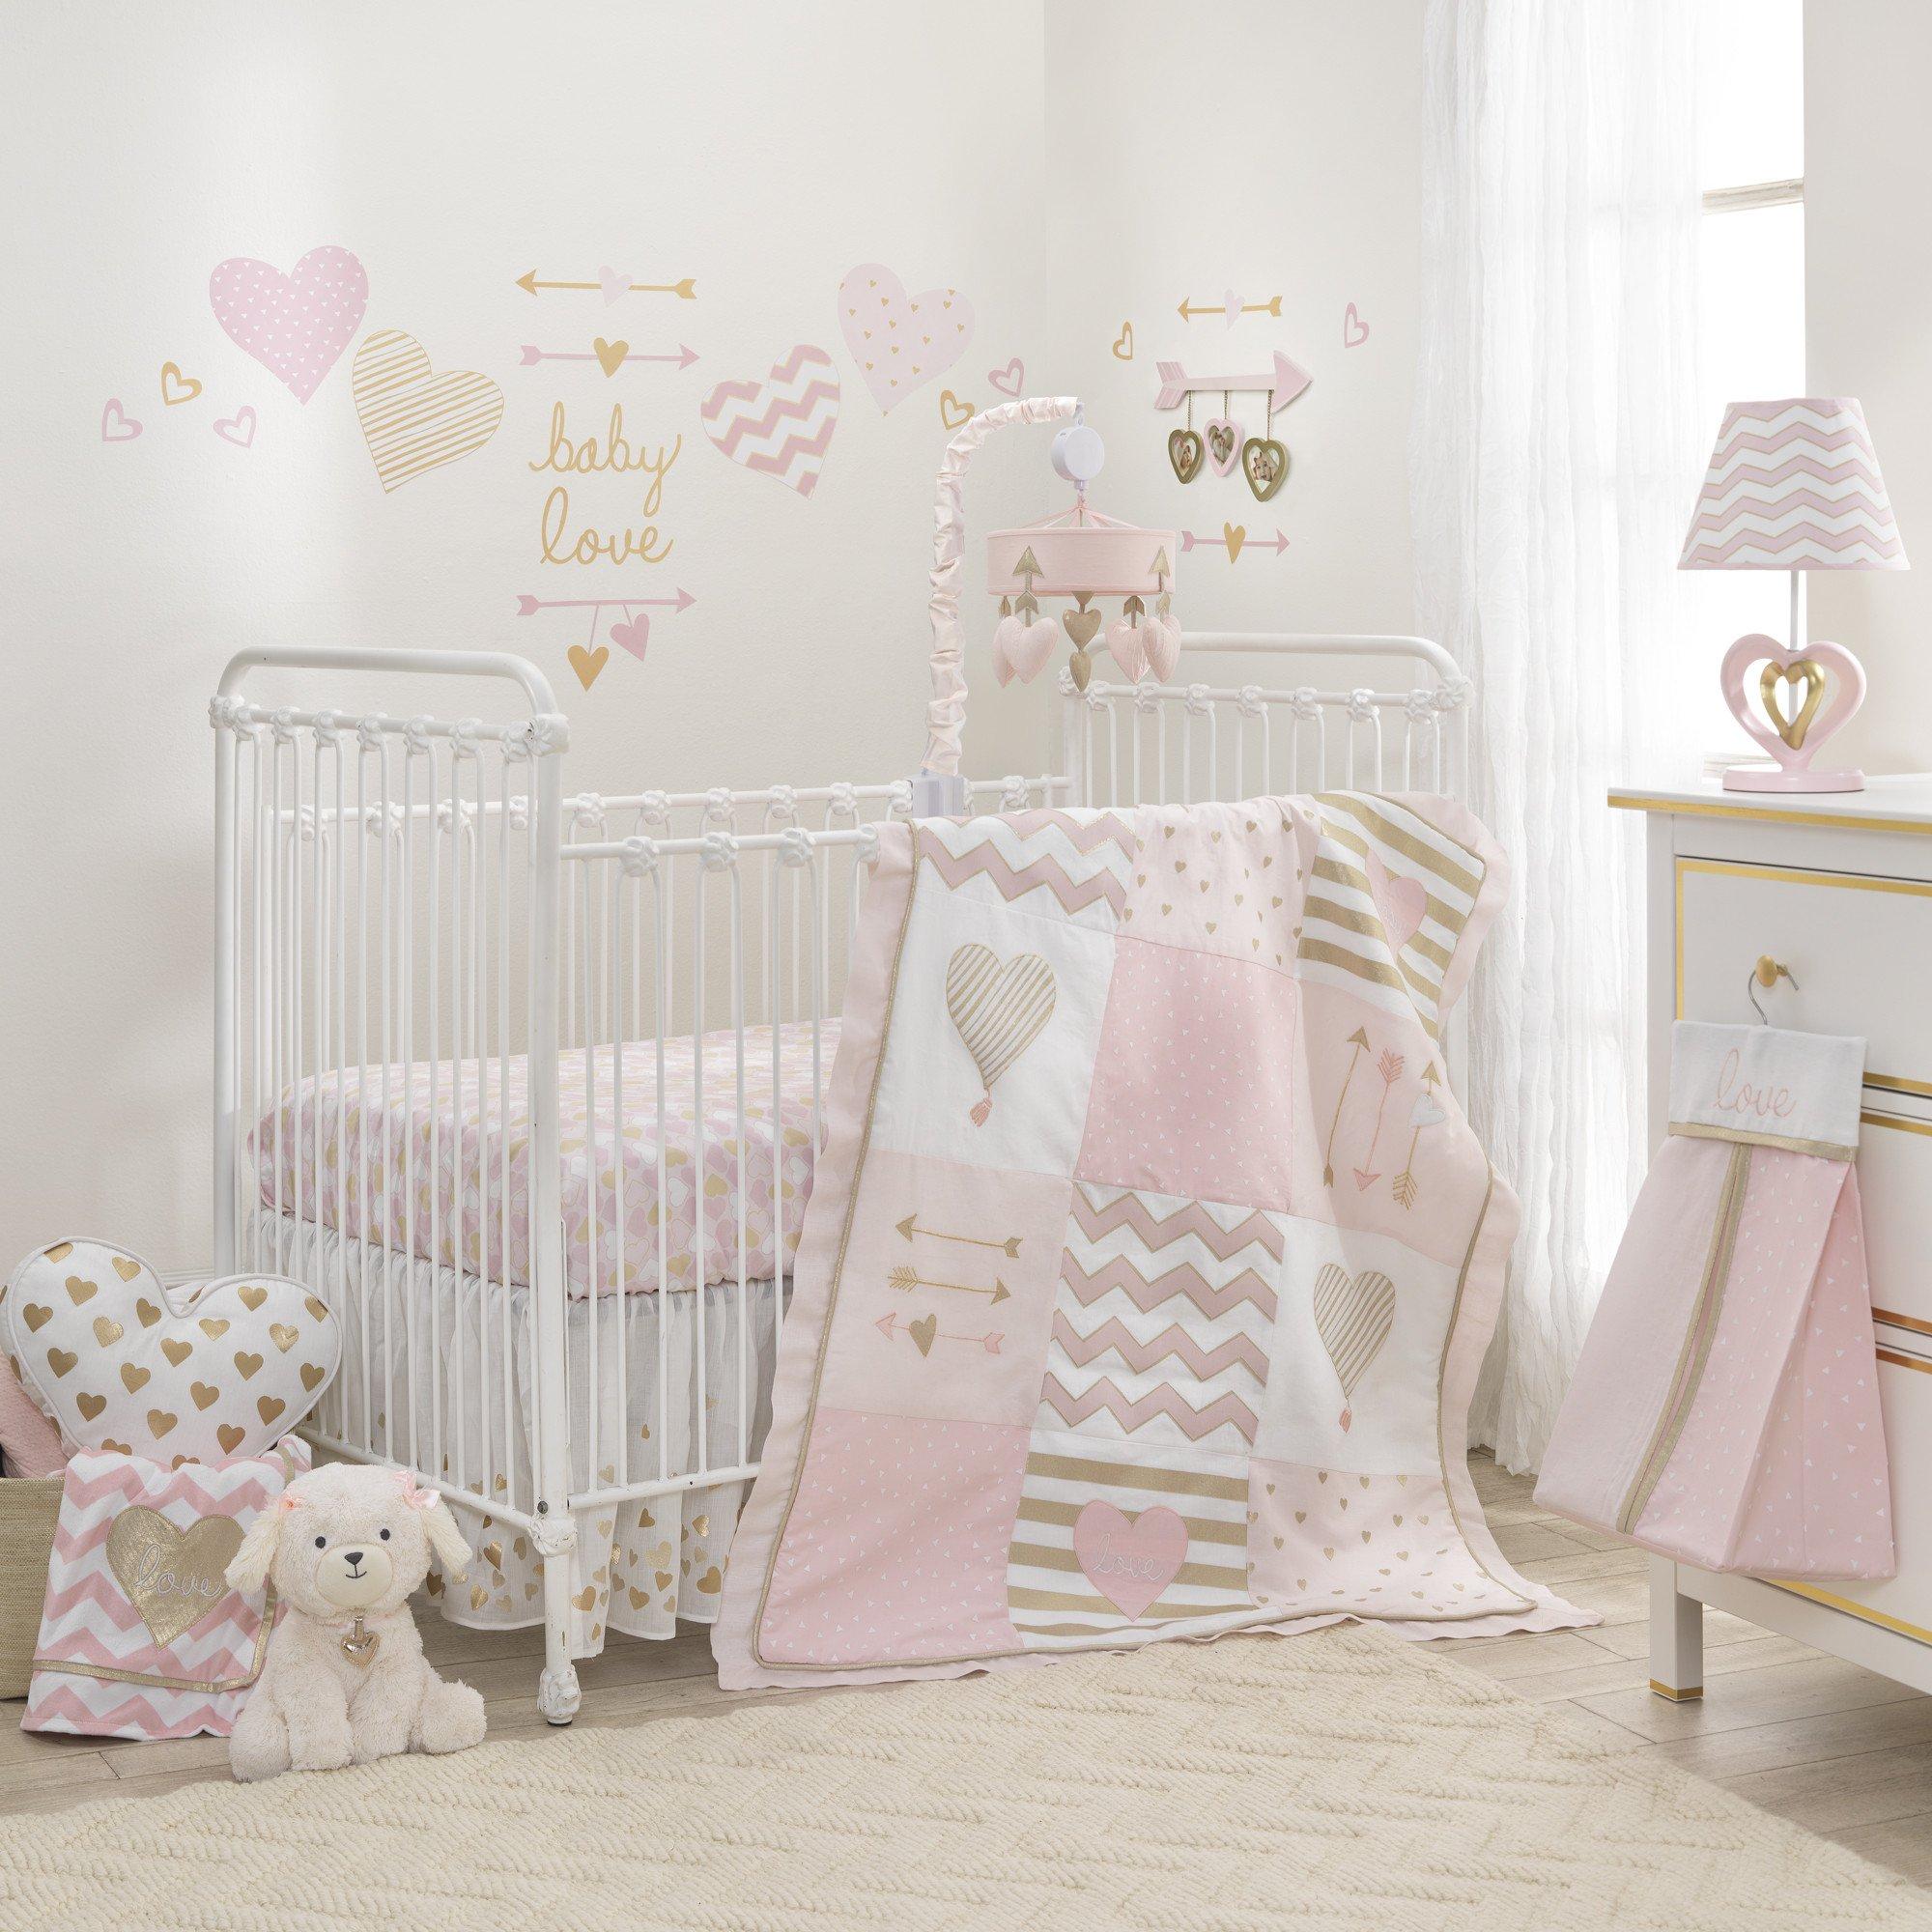 Baby Love Metallic Gold Pink White Hearts Stripes And Chevrons 4 Piece Nursery Crib Bedding Set In 2020 Crib Bedding Girl Girl Crib Bedding Sets Baby Crib Bedding